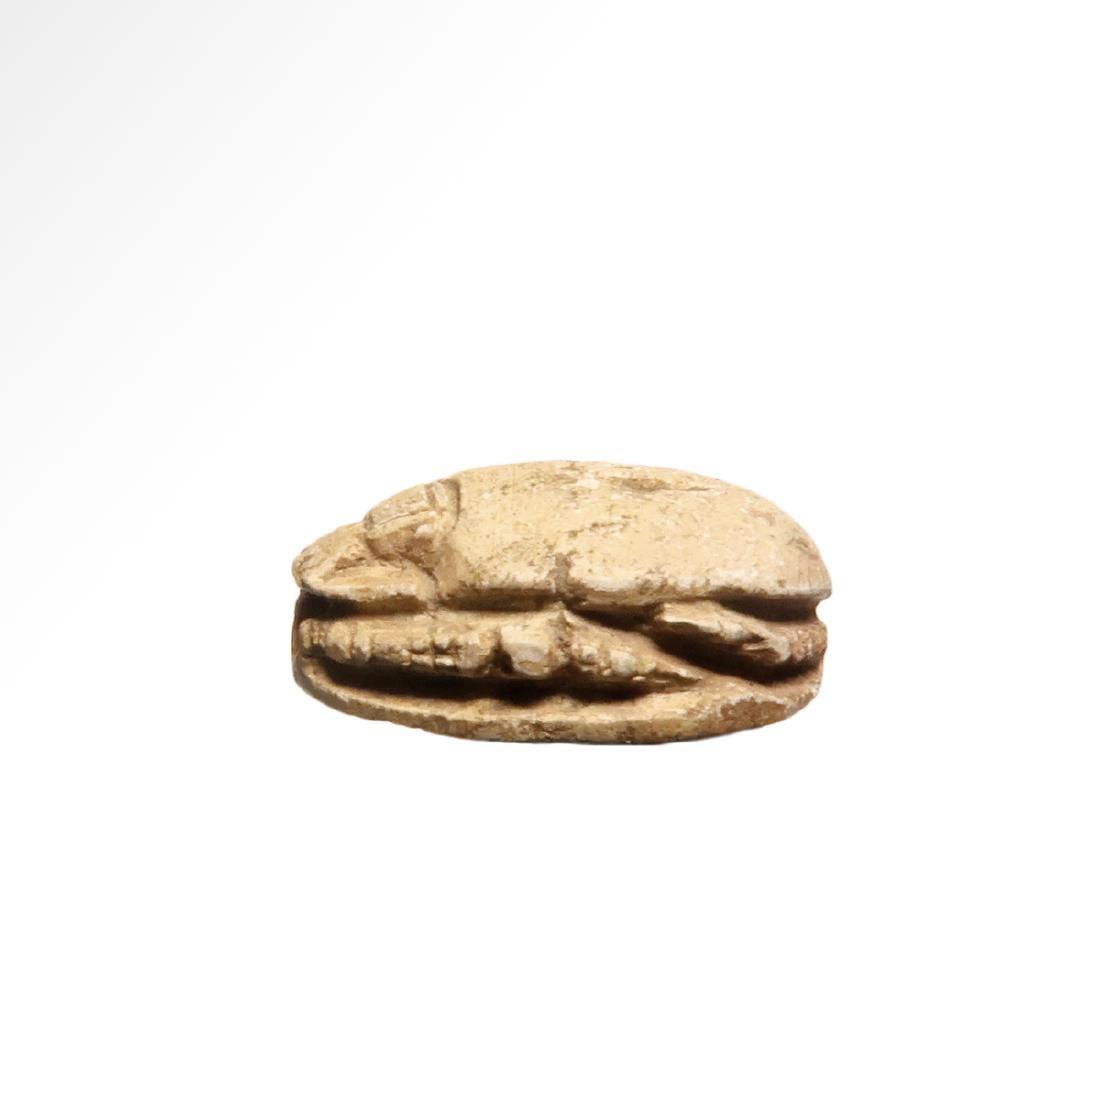 Egyptian Steatite Scarab, Hieroglyphs and Cartouche - 4